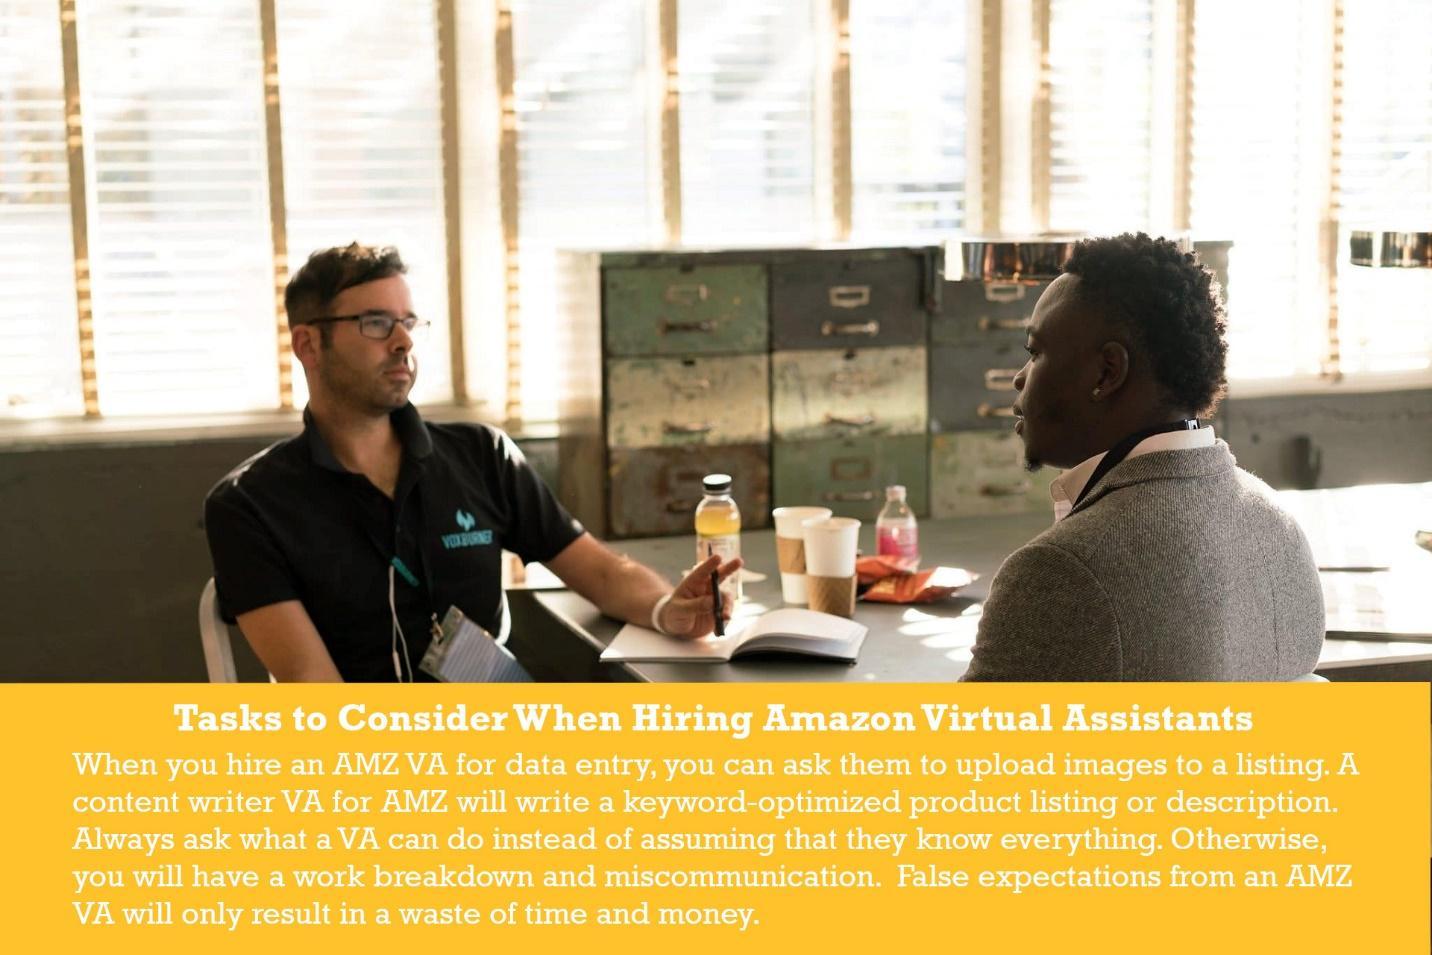 D:\AmazinEcommerce New Folder\dailytechquest.com images\4. job interview amazon seller central virtual assistant.jpg